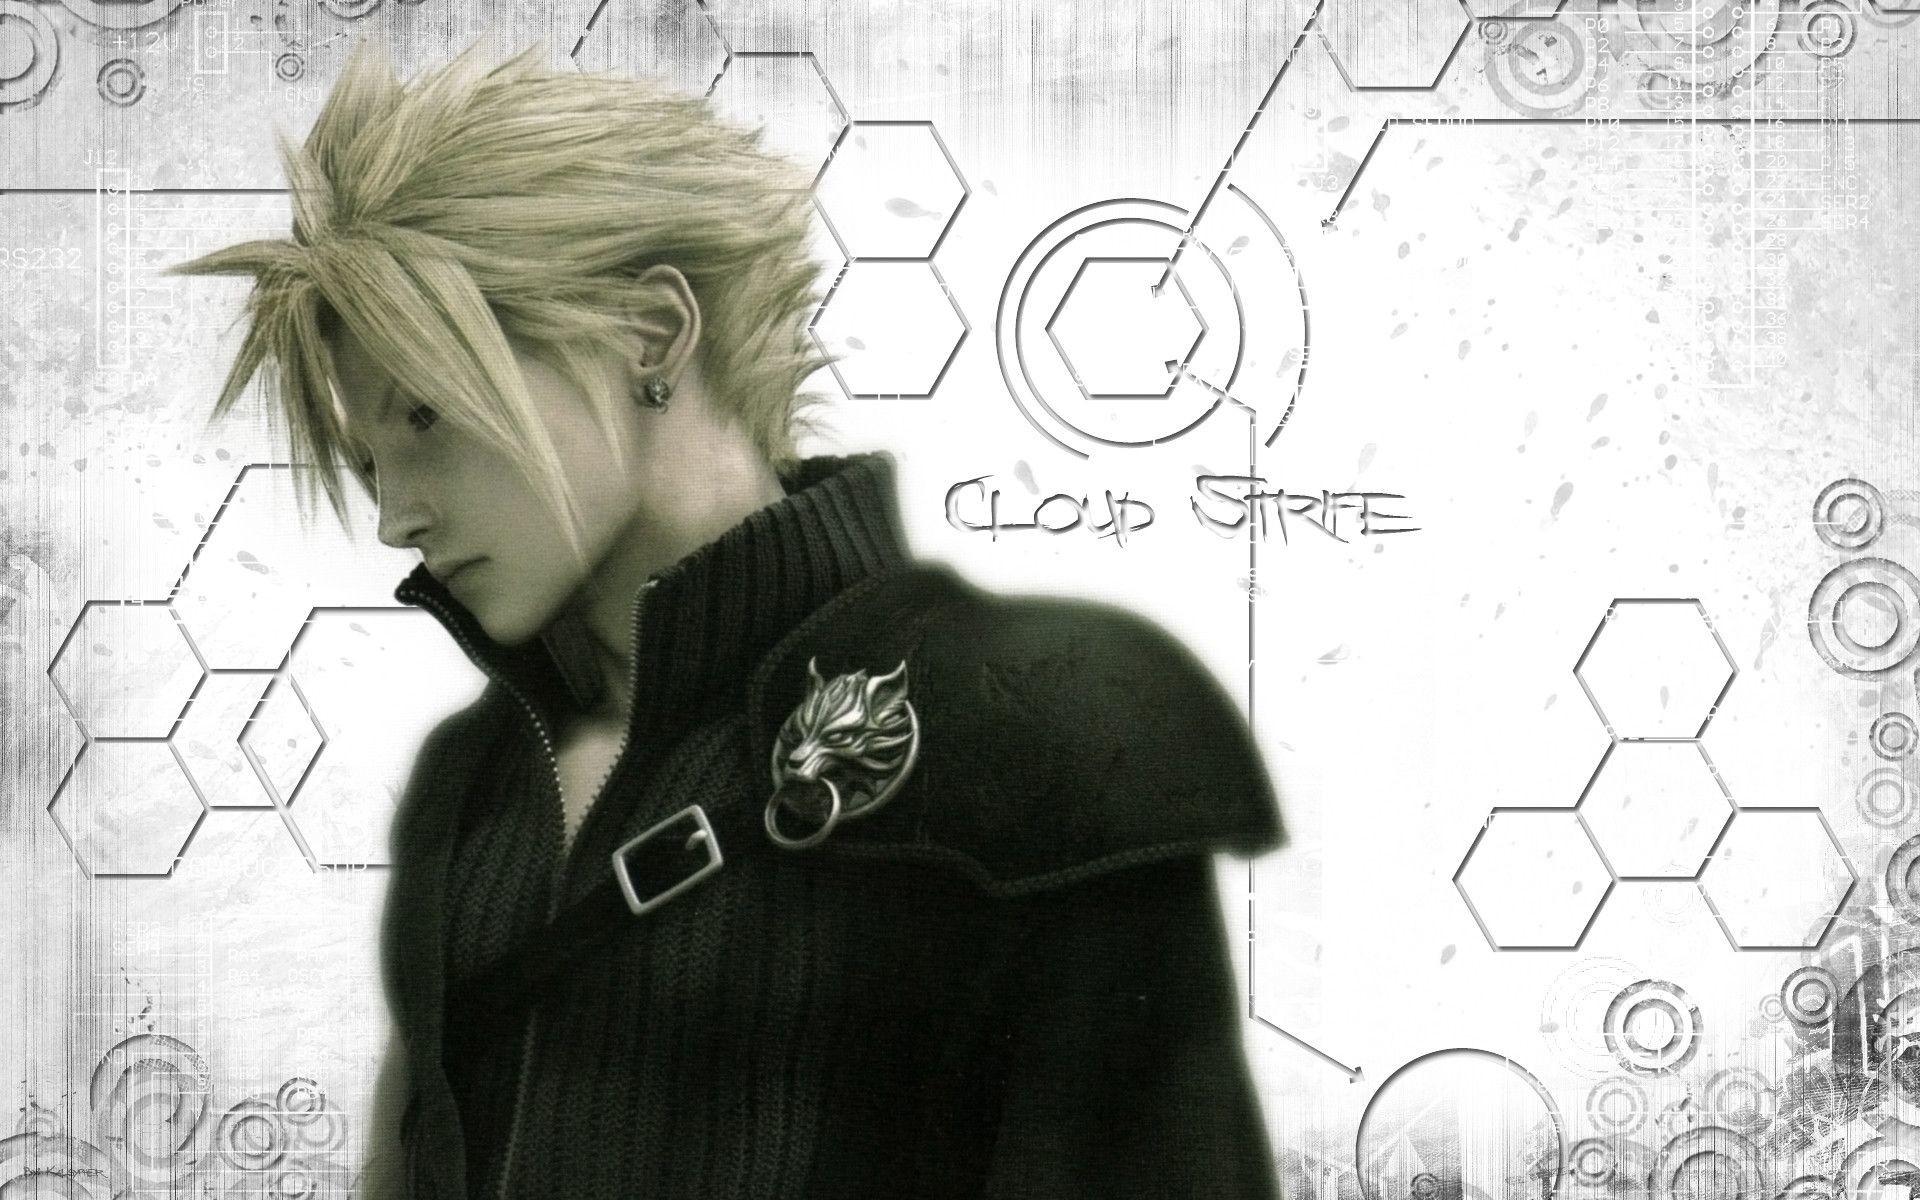 Cloud Strife Final Fantasy Wallpapers | HD Wallpapers | Pinterest | Cloud  strife, Final fantasy and Final fantasy cloud